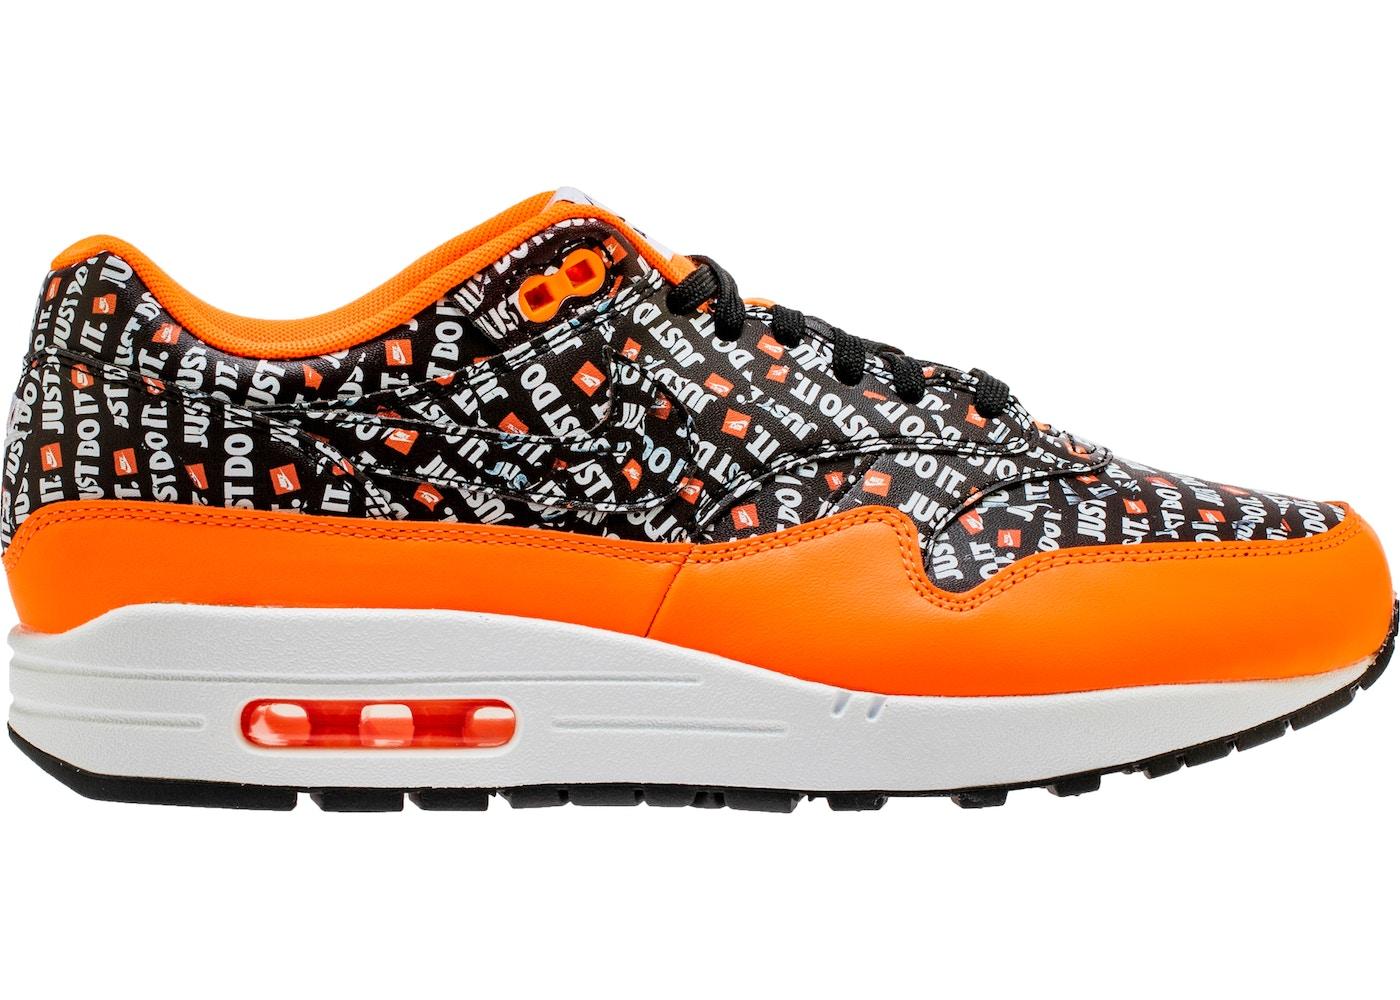 Nike Air Max Shoes - Volatility 0d9d6d6eb